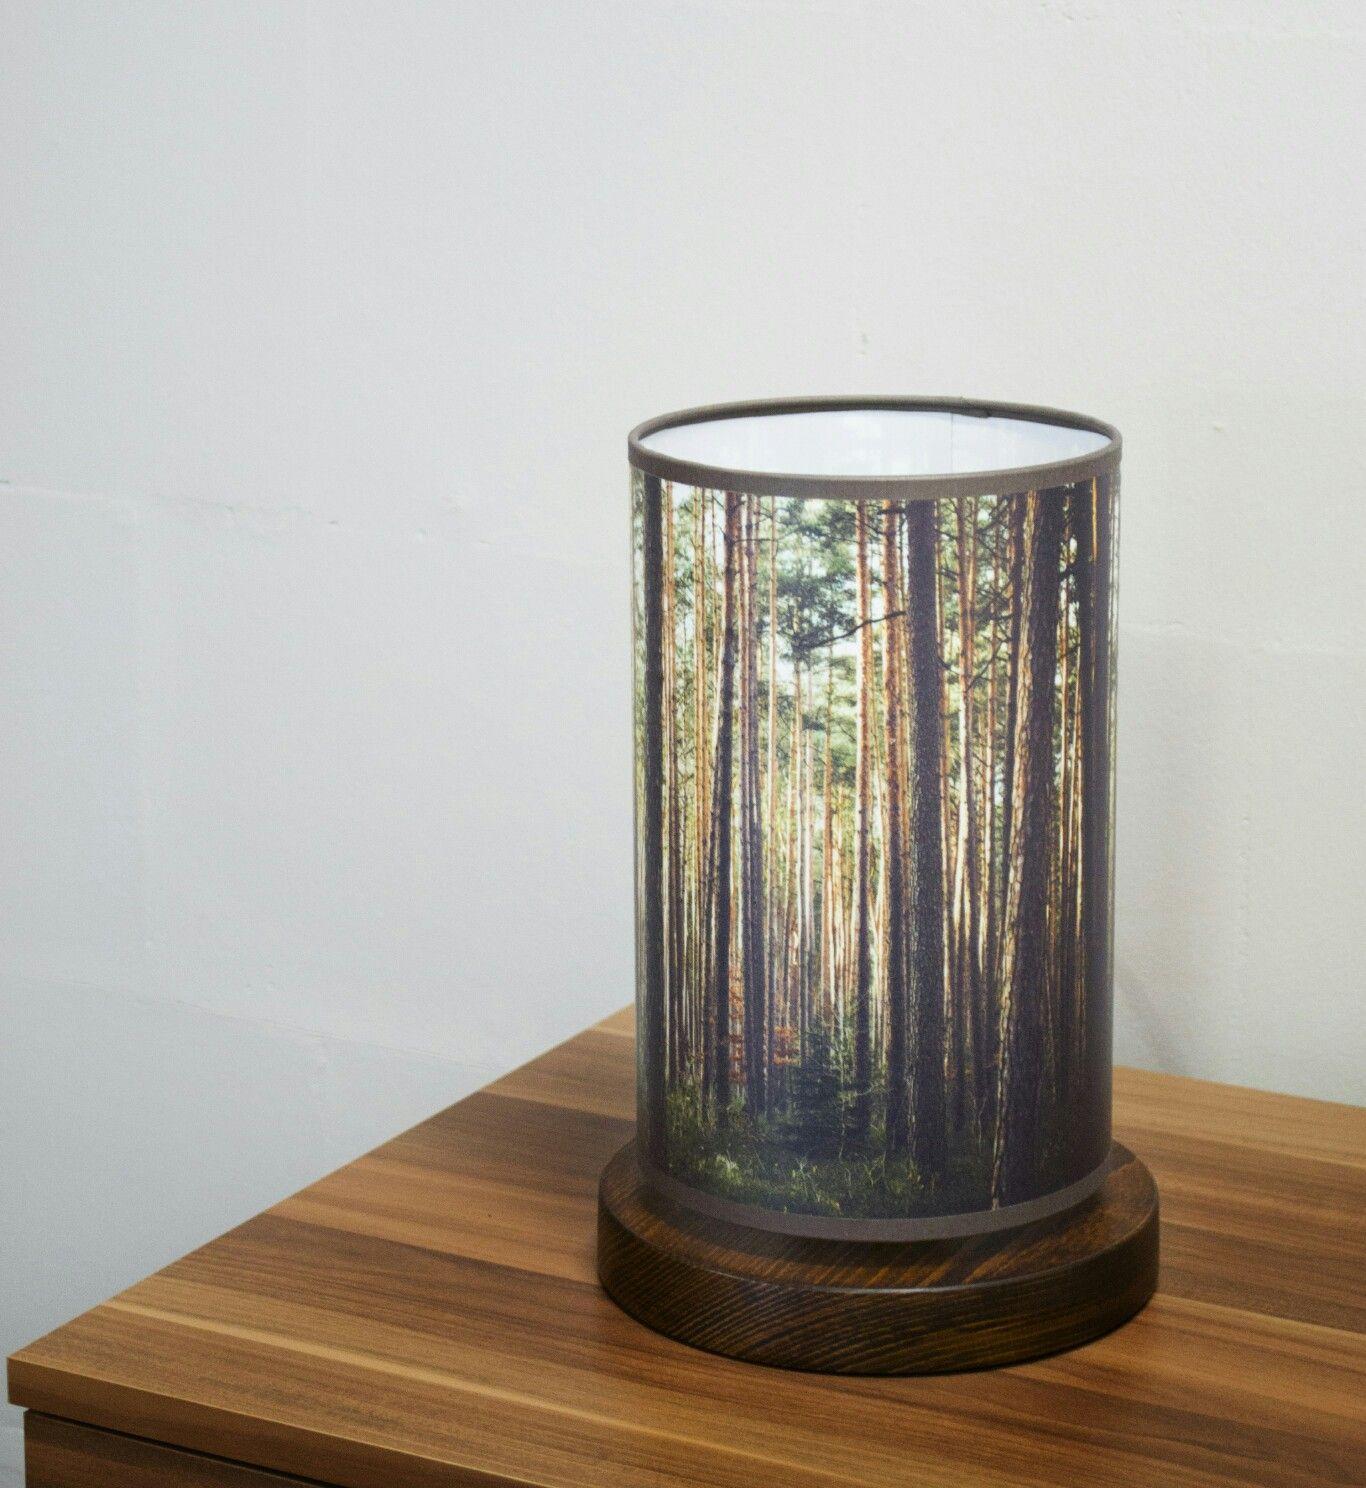 Lampa Stojaca Nocna Las Fotolampy Las Forest Wood Decoration Bedroom Lamp Light Lampa Nocna Stojaca With Images Lampy Lasy Produkty